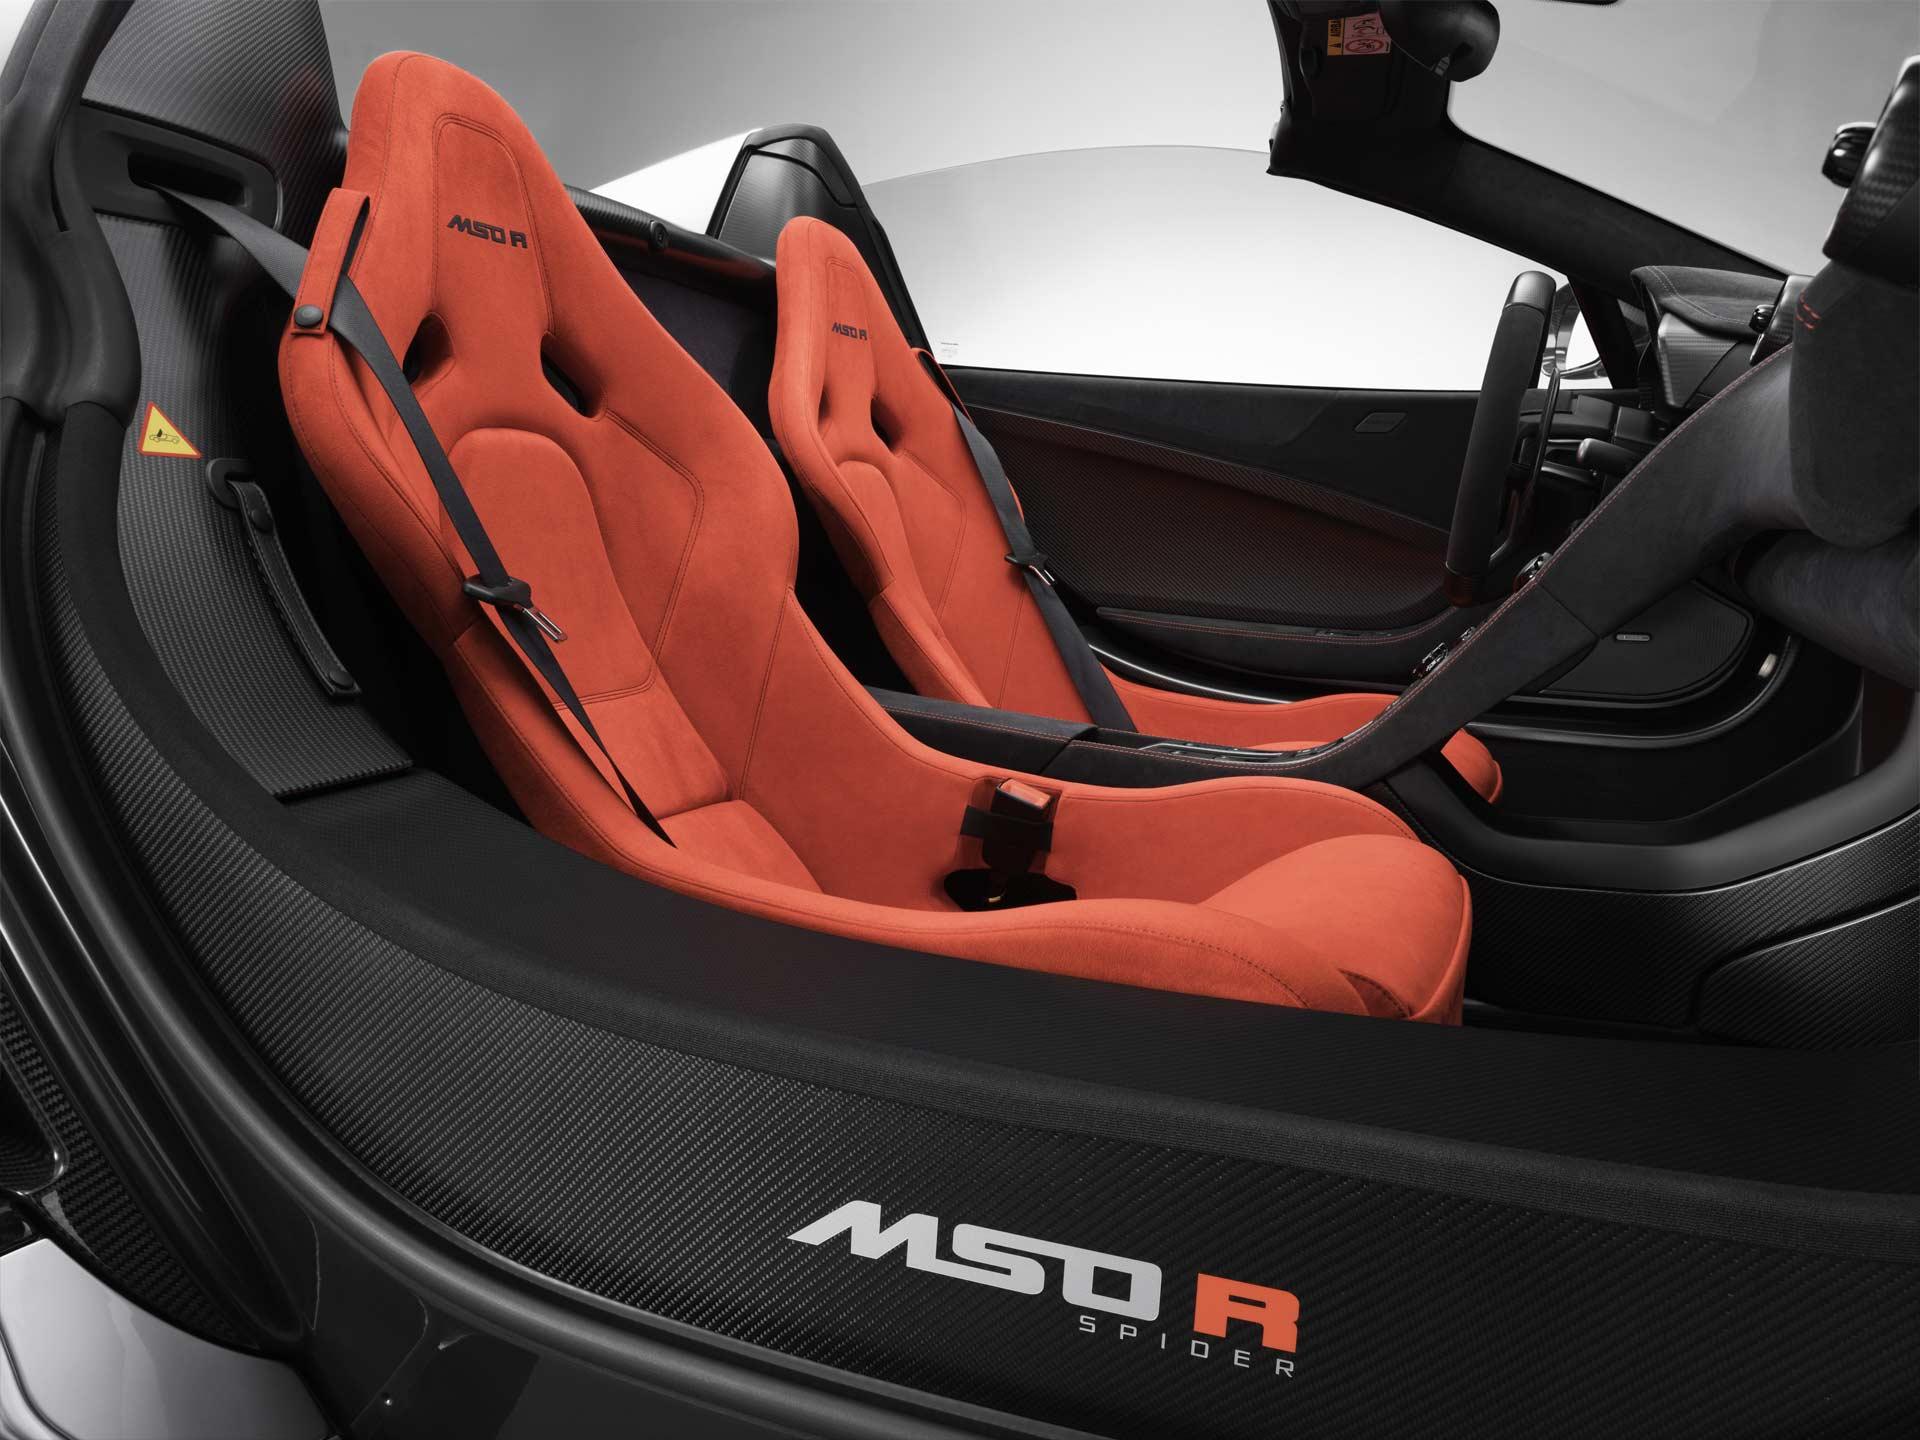 McLaren-MSO-R-Spider-interior